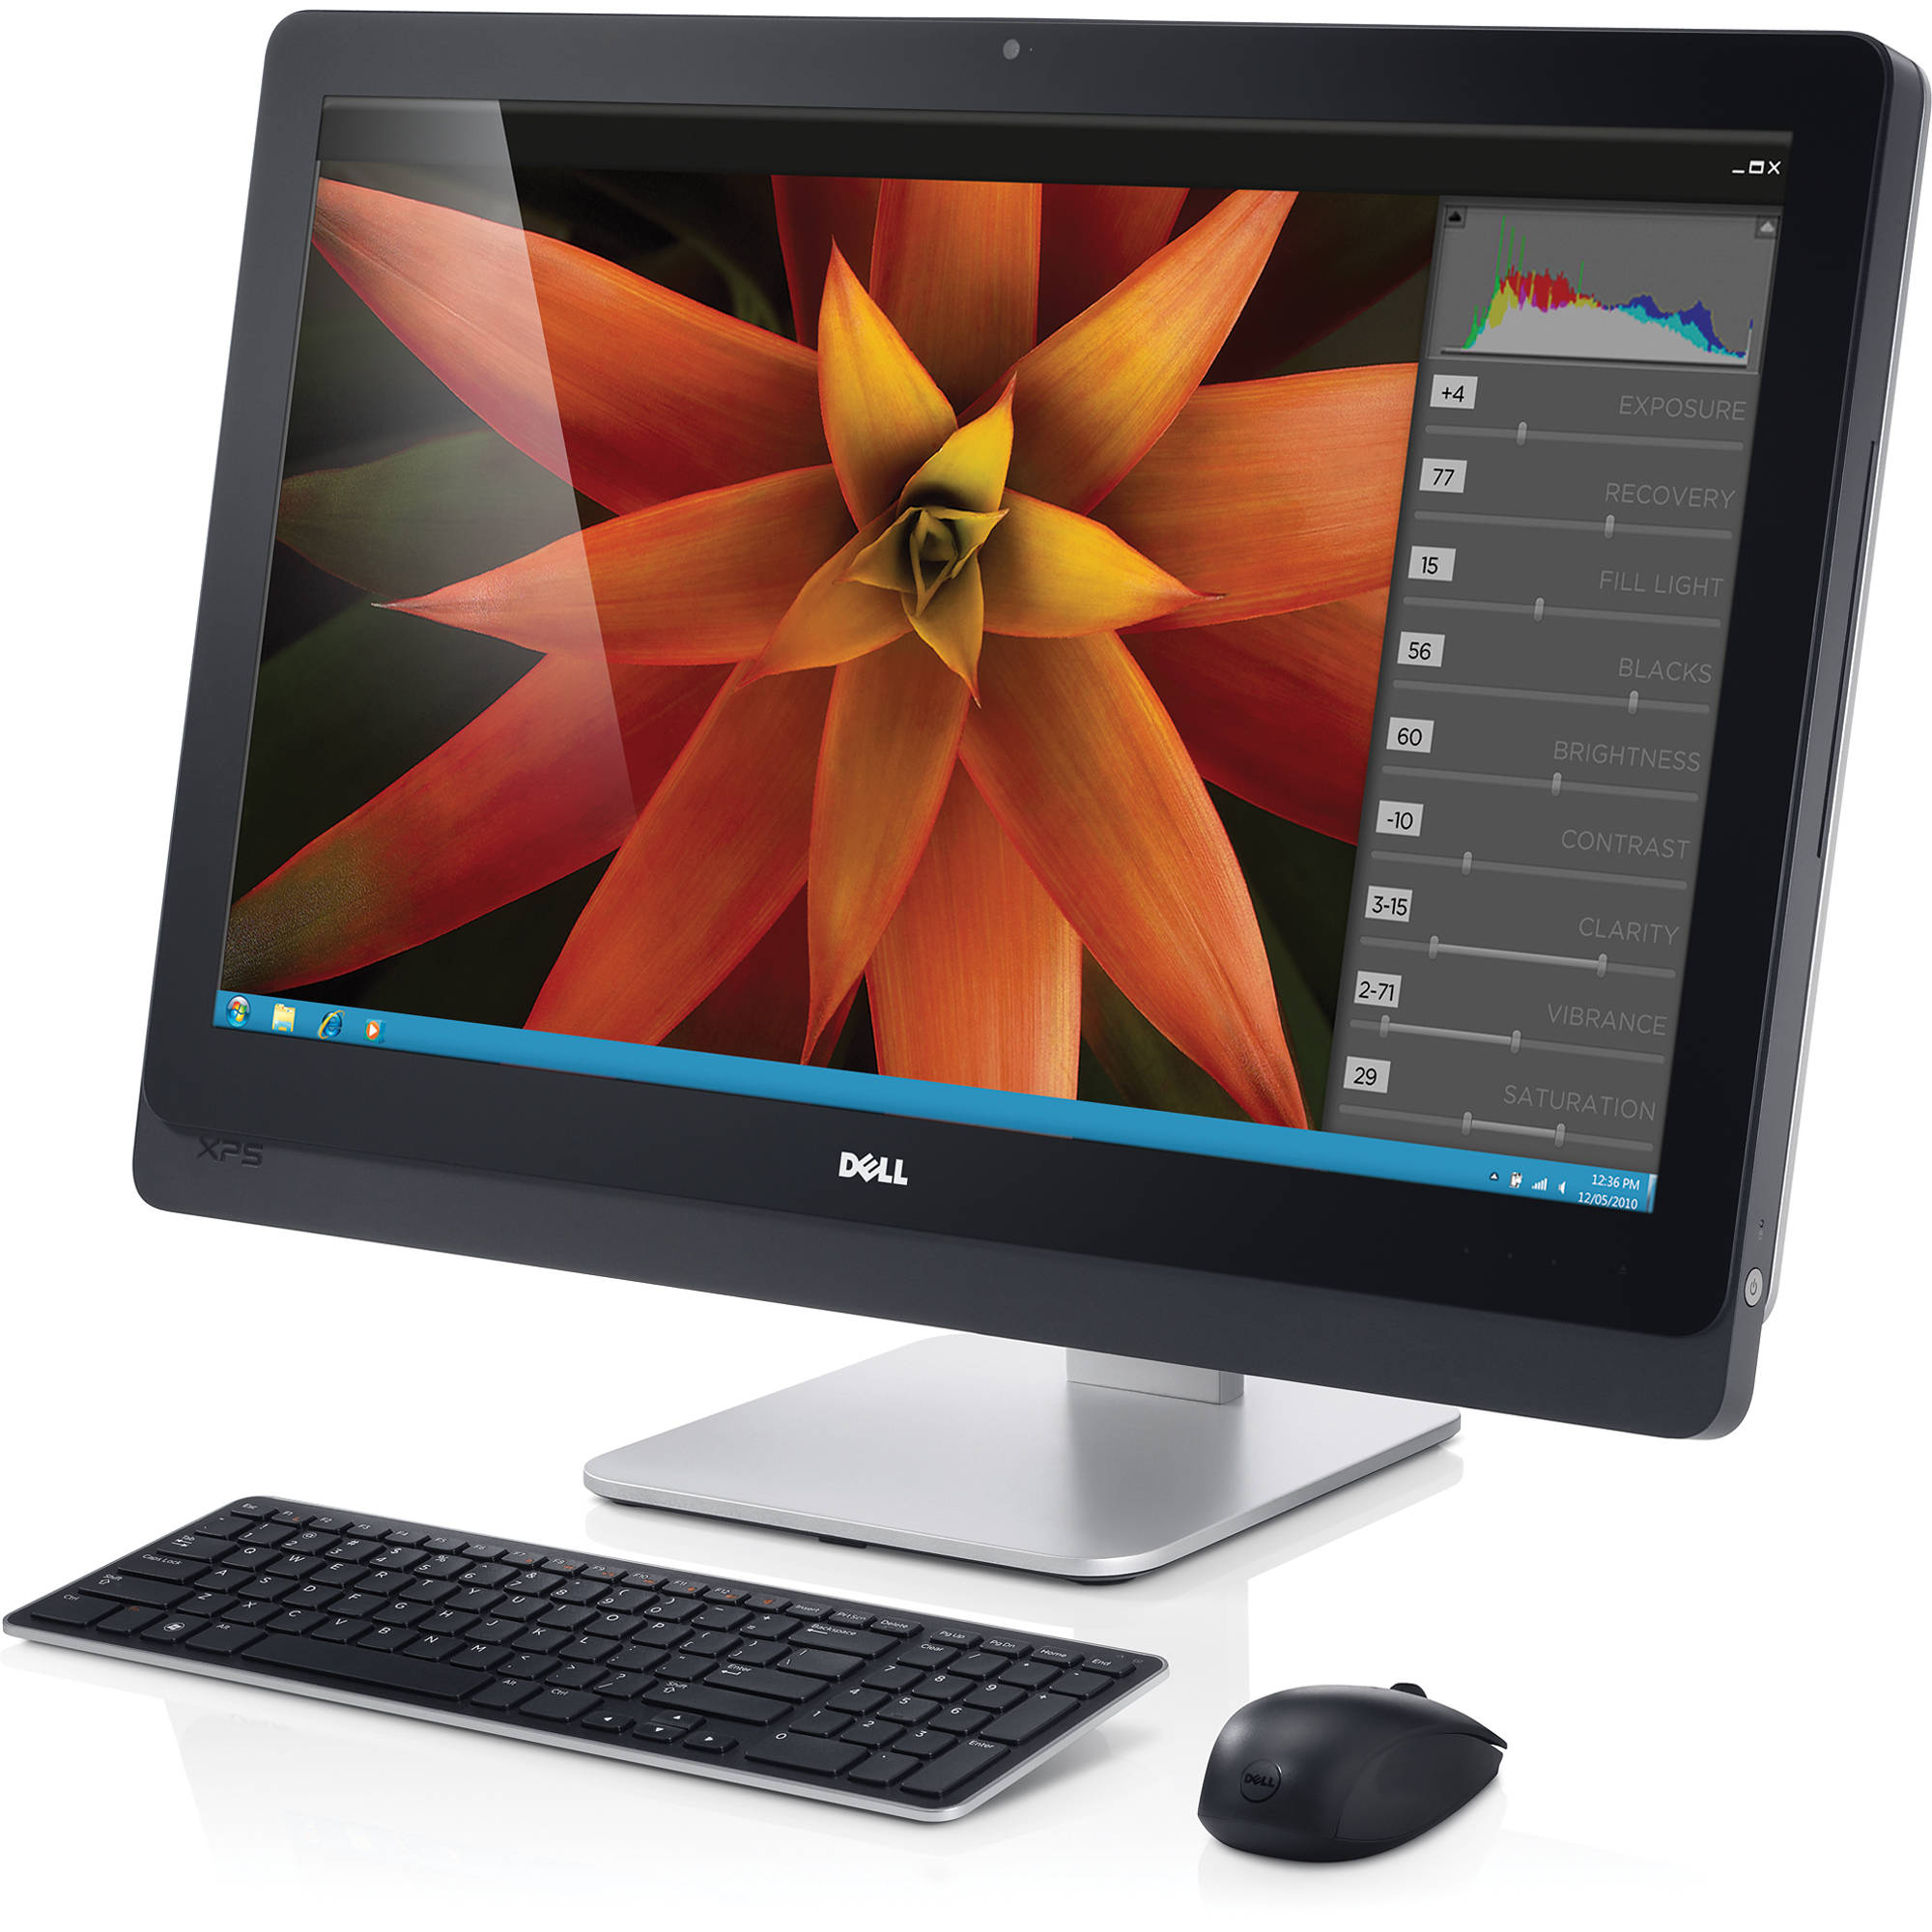 dell xps one 27 all in one desktop computer xpso27 2942bk. Black Bedroom Furniture Sets. Home Design Ideas